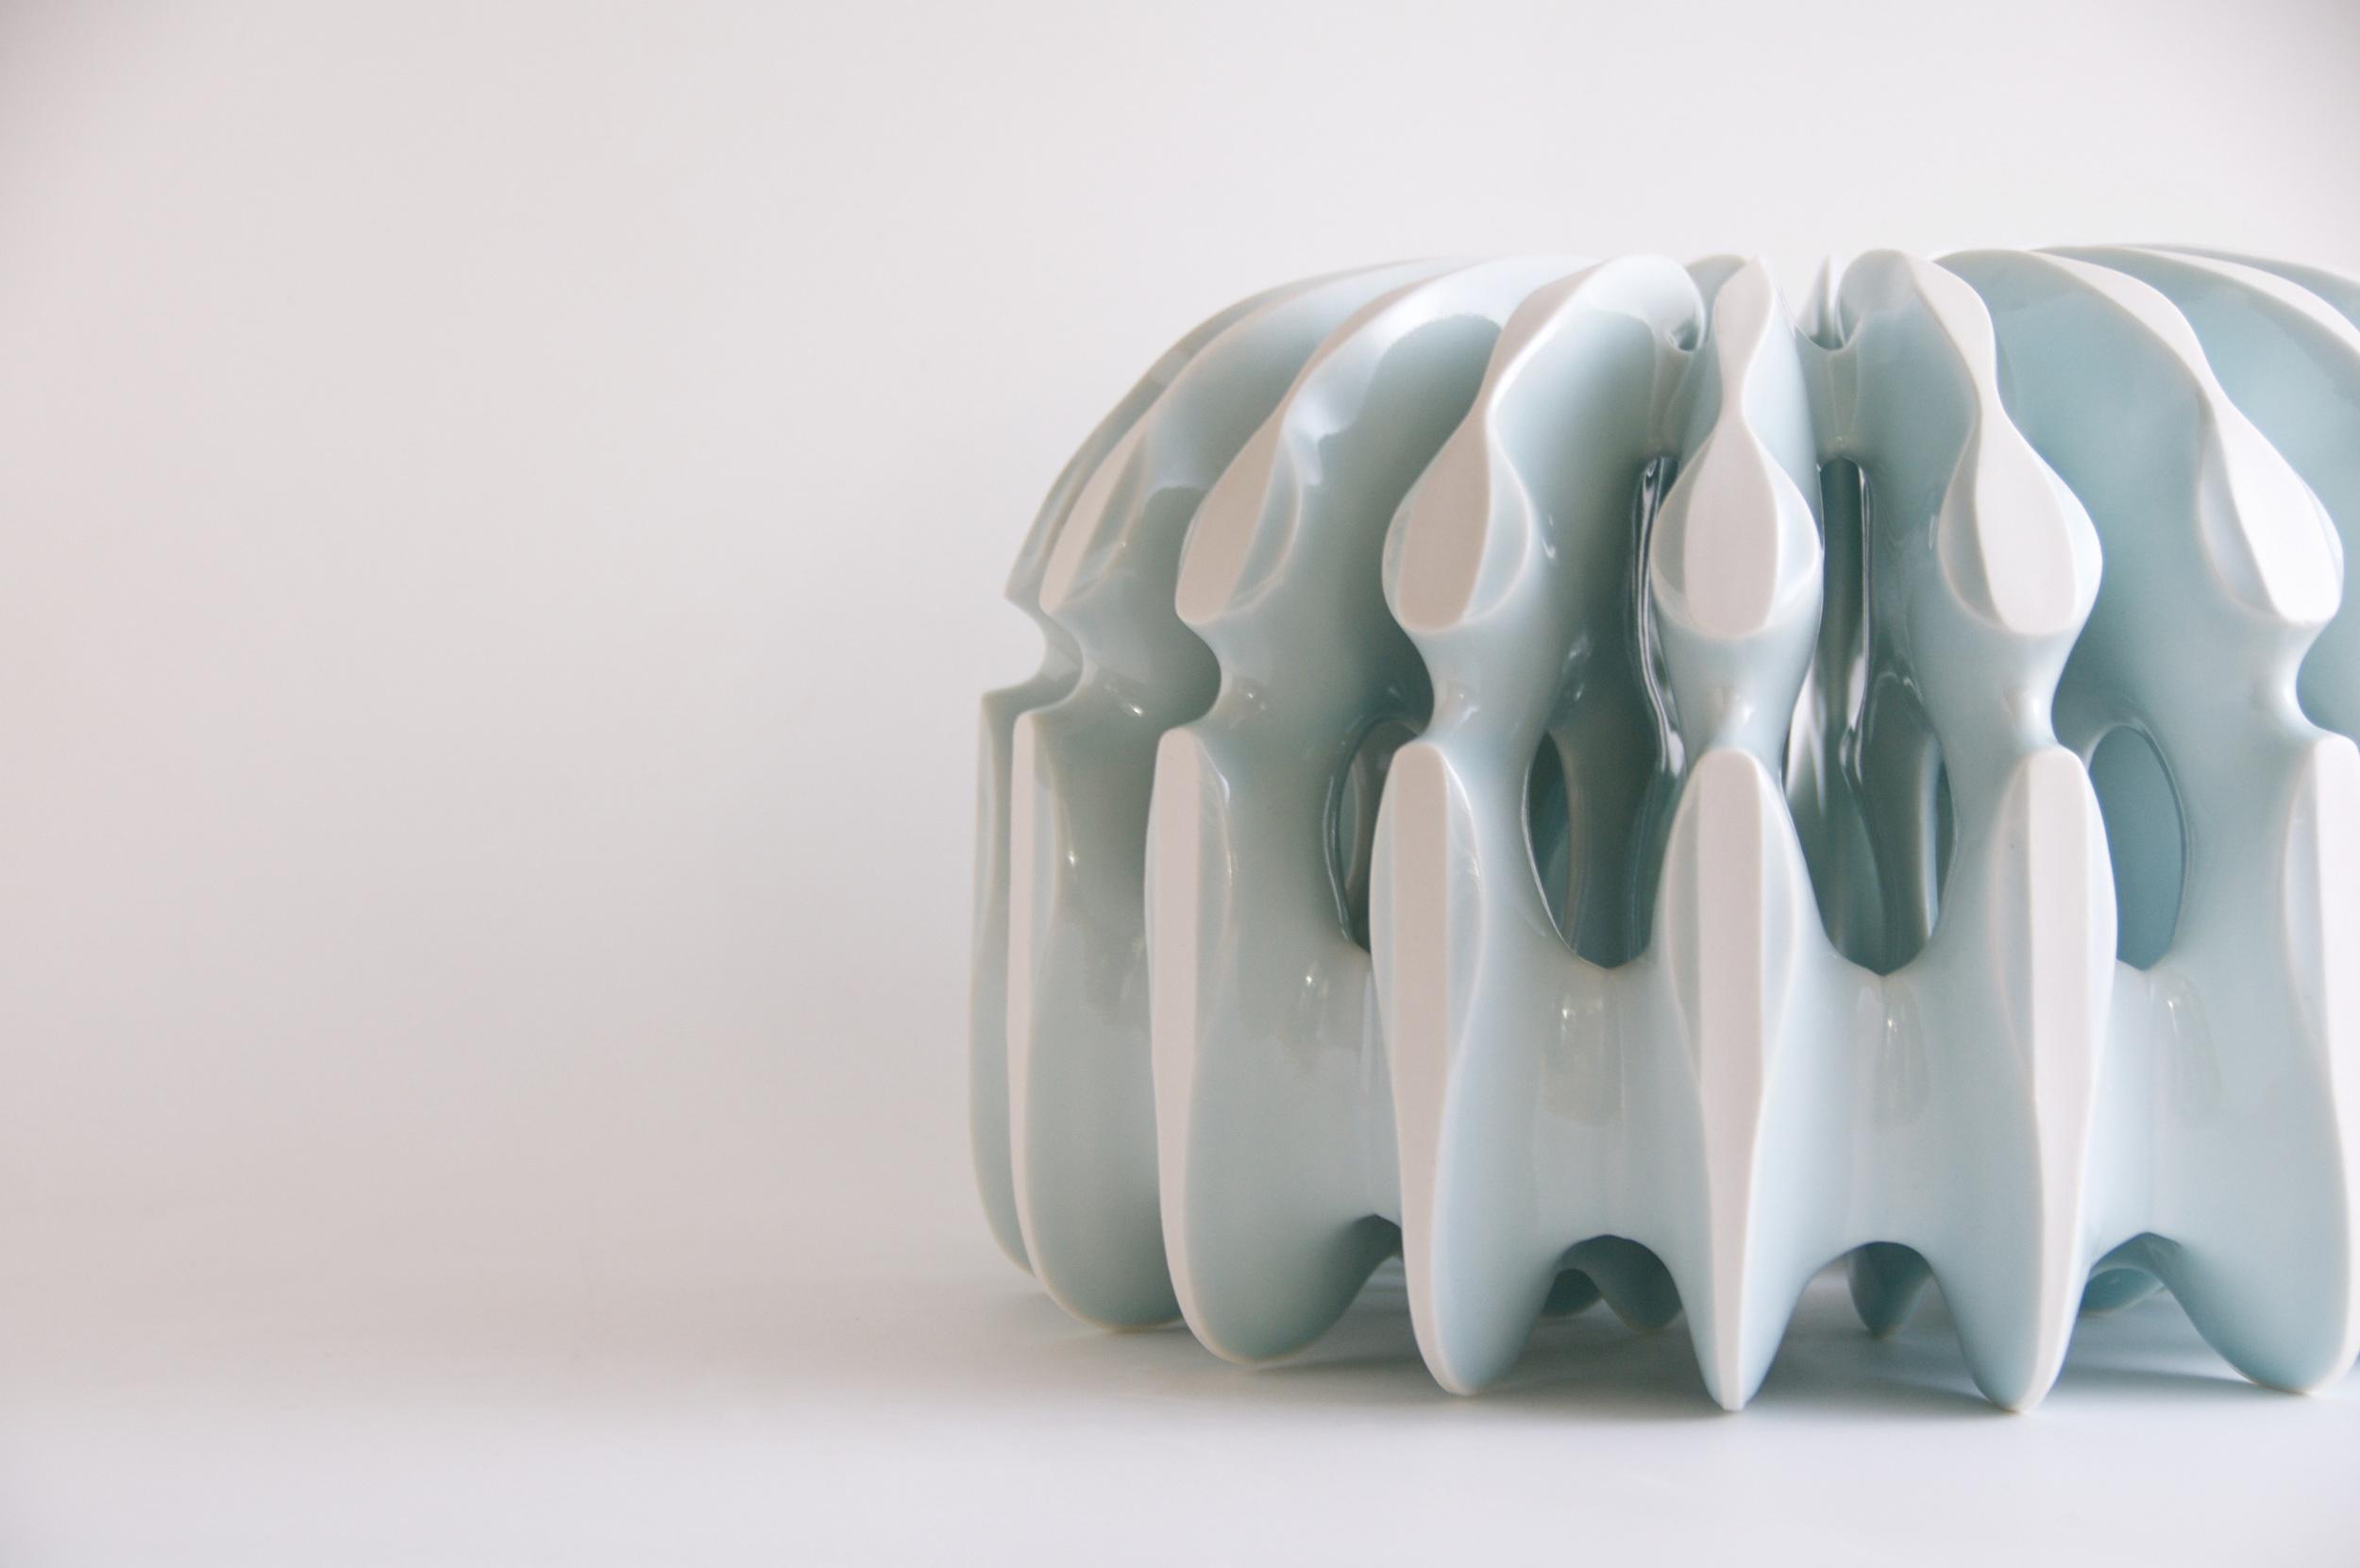 'Dome' 2016, Kenji Uranishi, slip-cast porcelain